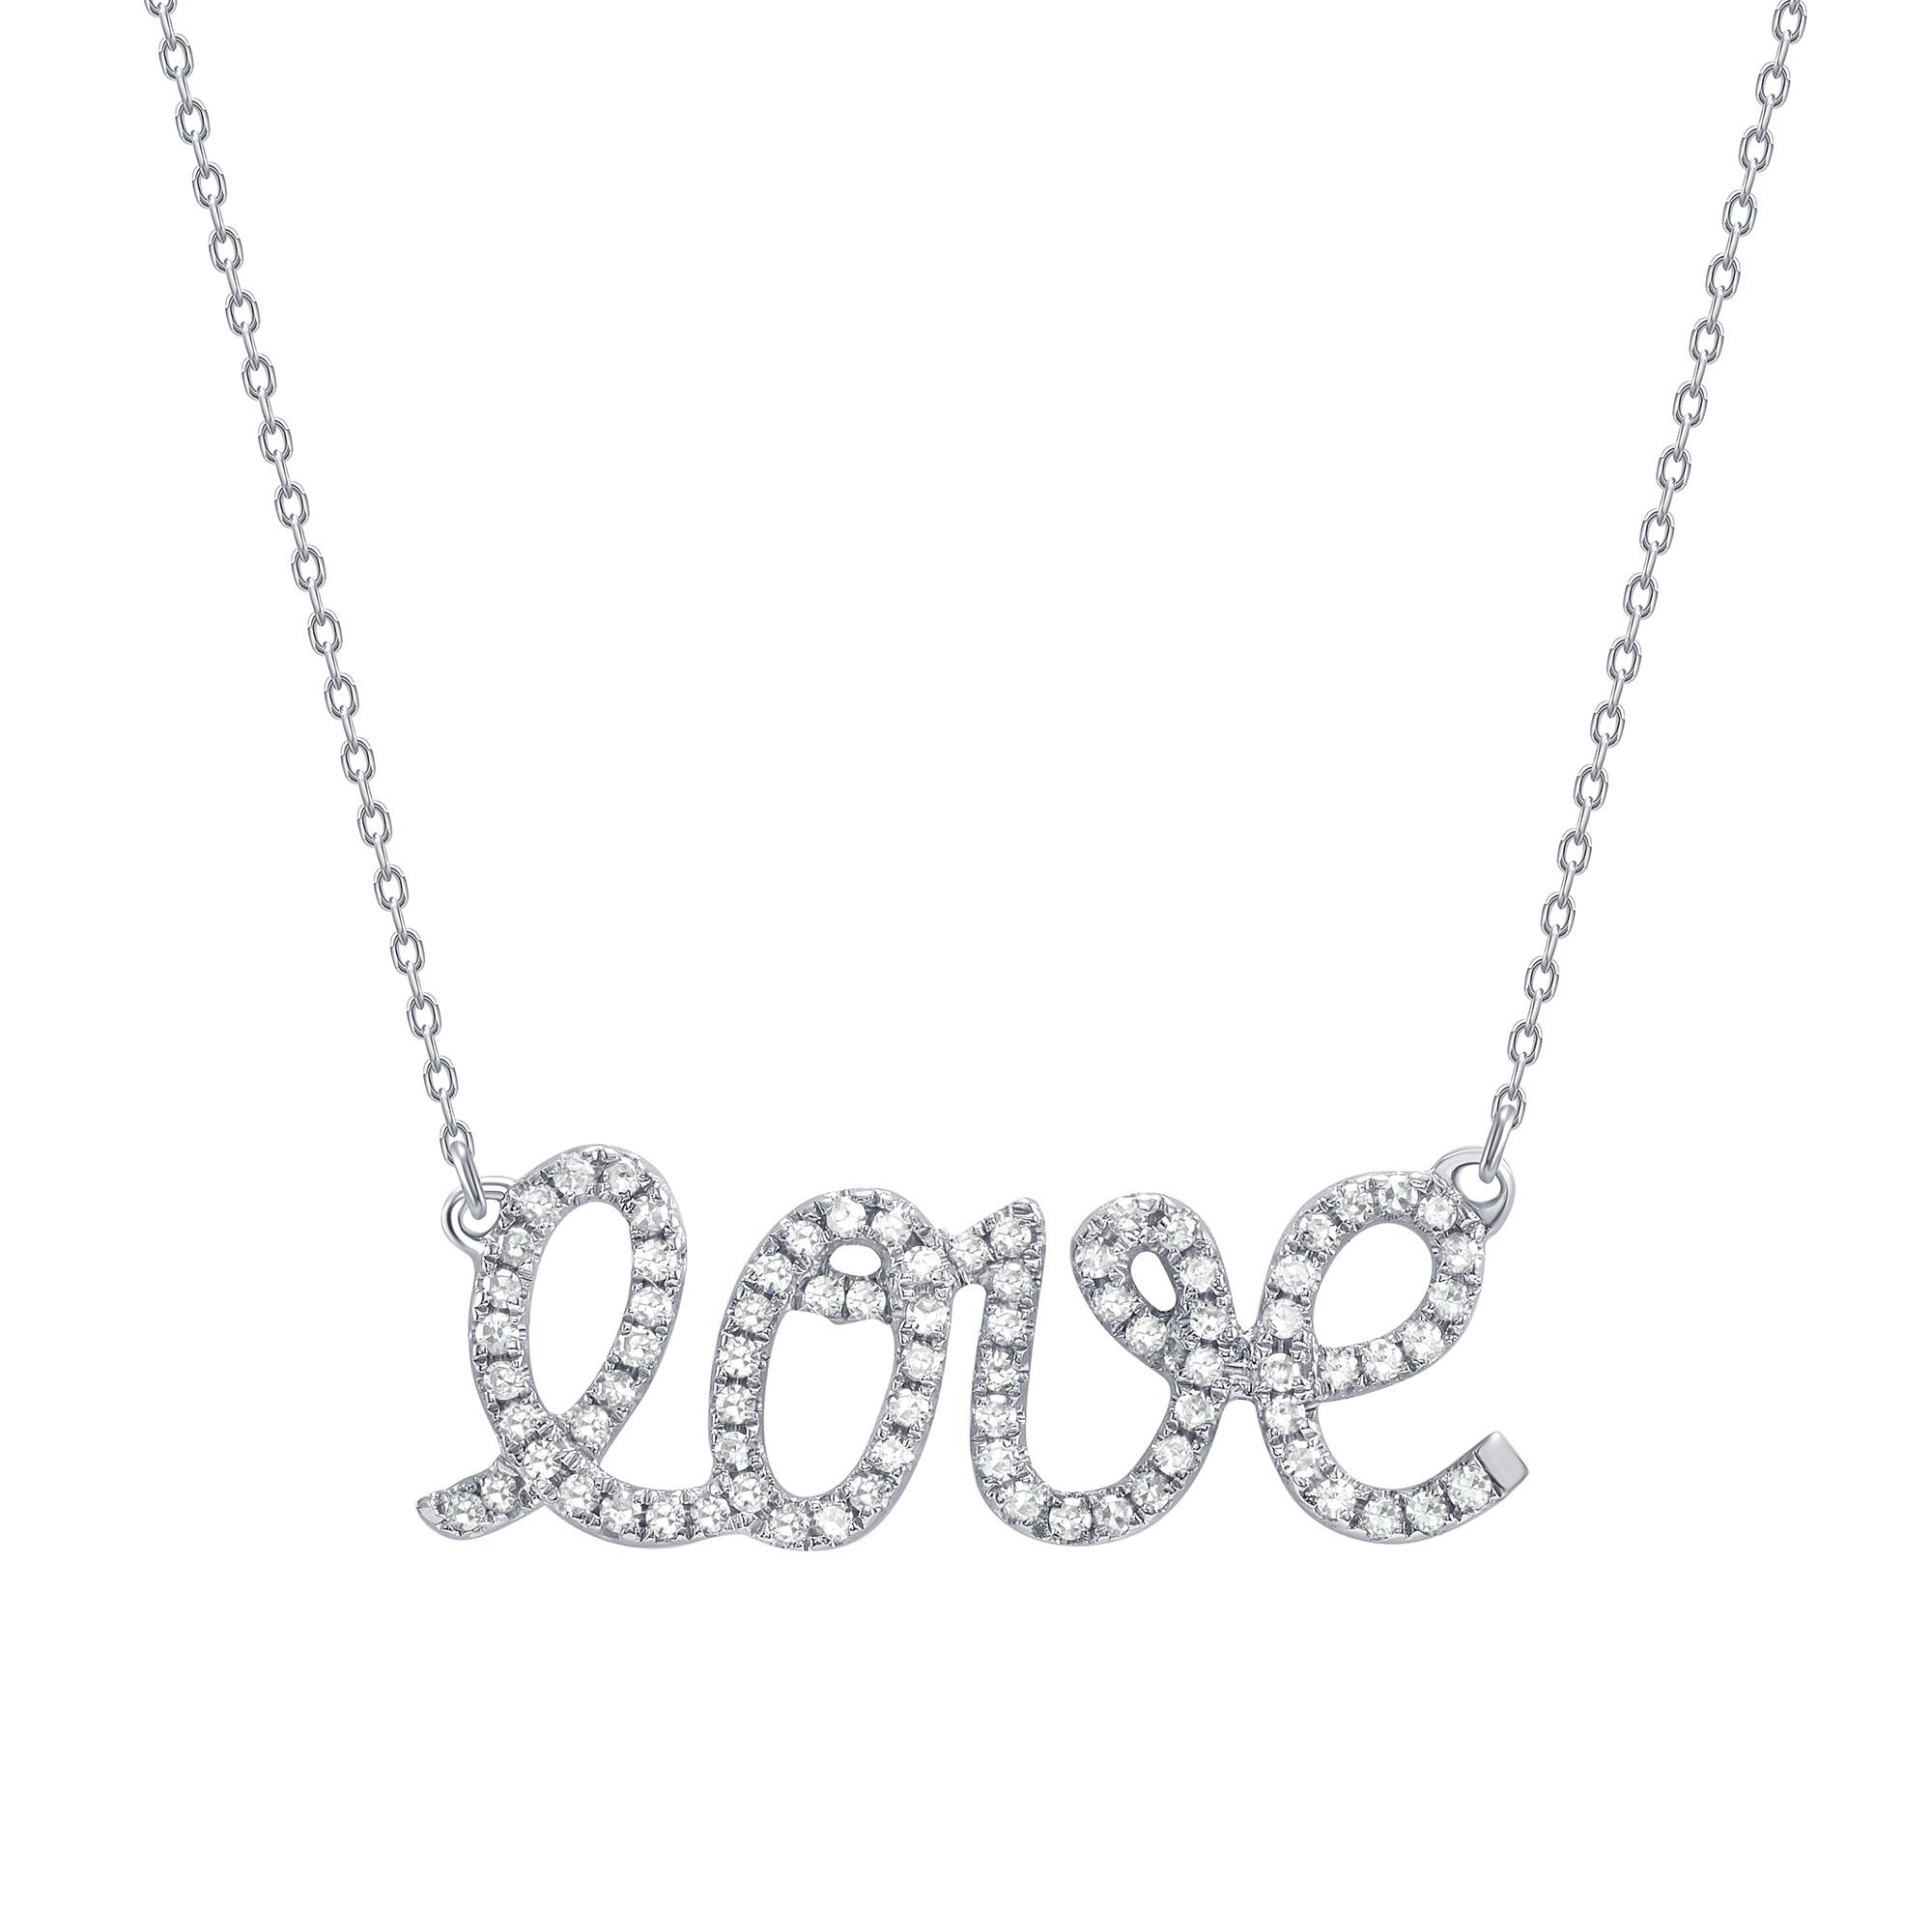 Diamond love pendant necklace  white gold